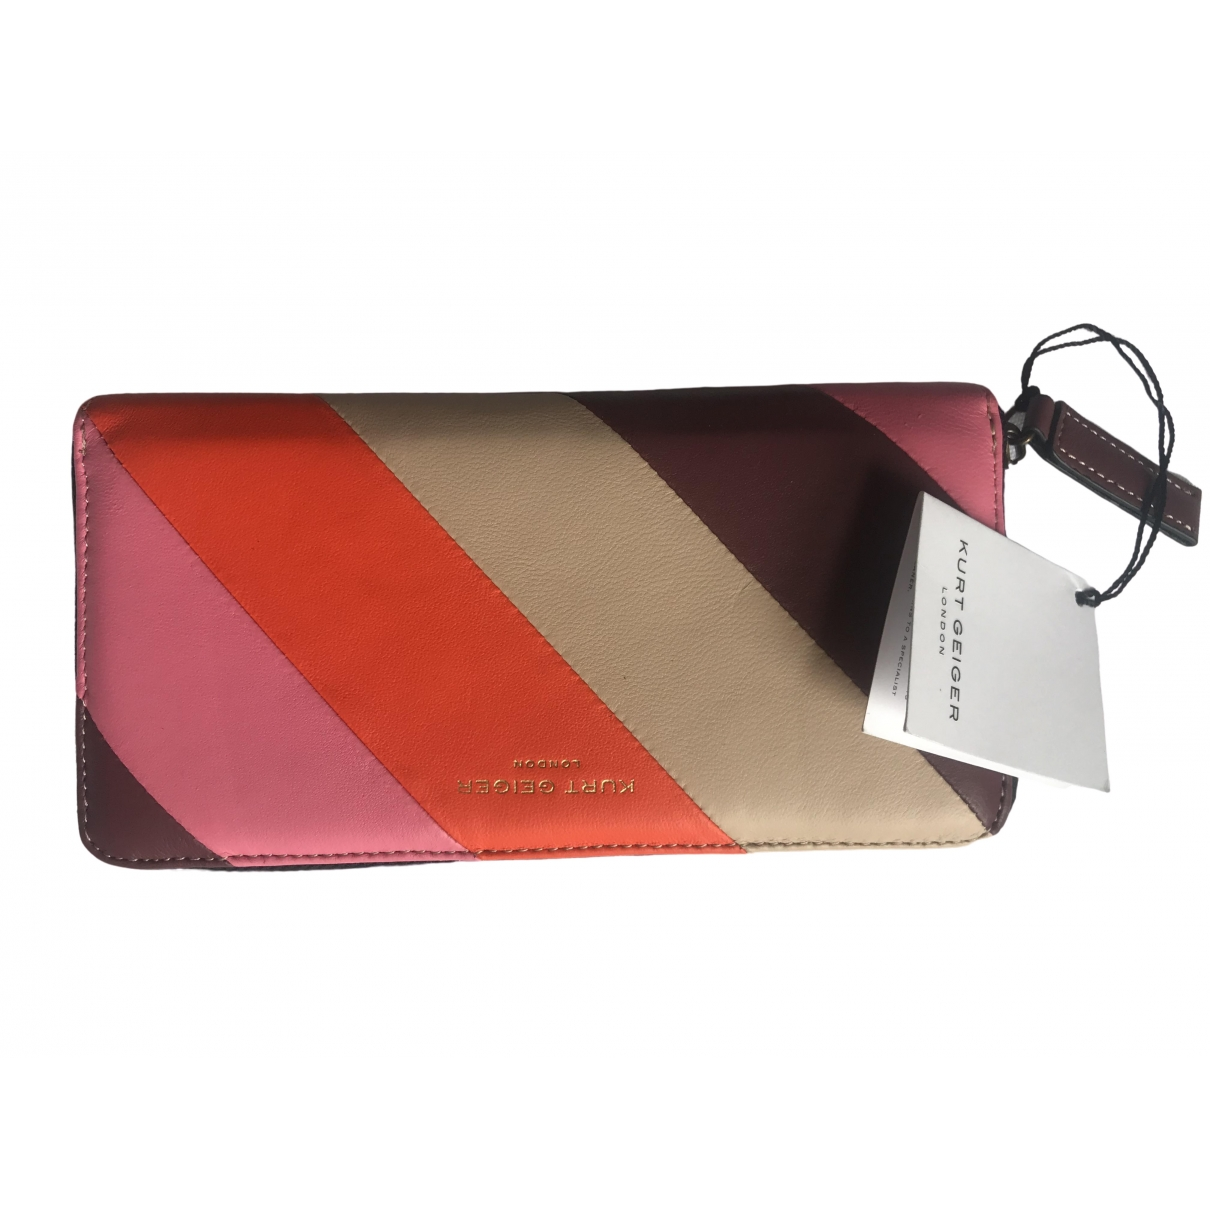 Kurt Geiger \N Multicolour Leather Purses, wallet & cases for Women \N